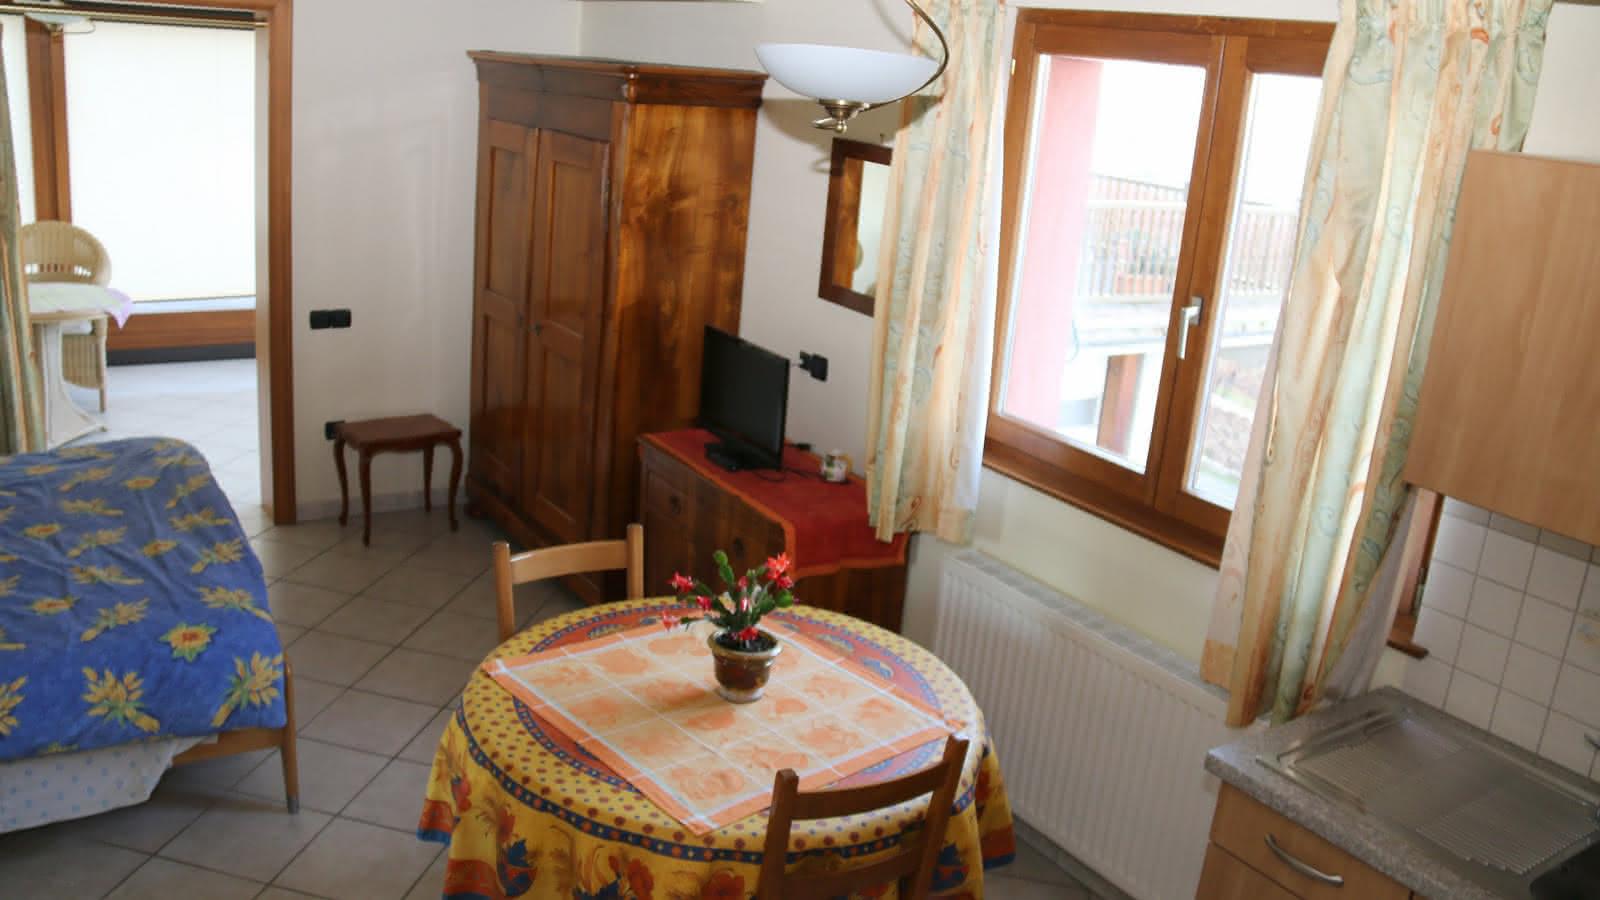 Chambres D Hotes Gilberte Schneider Visit Alsace